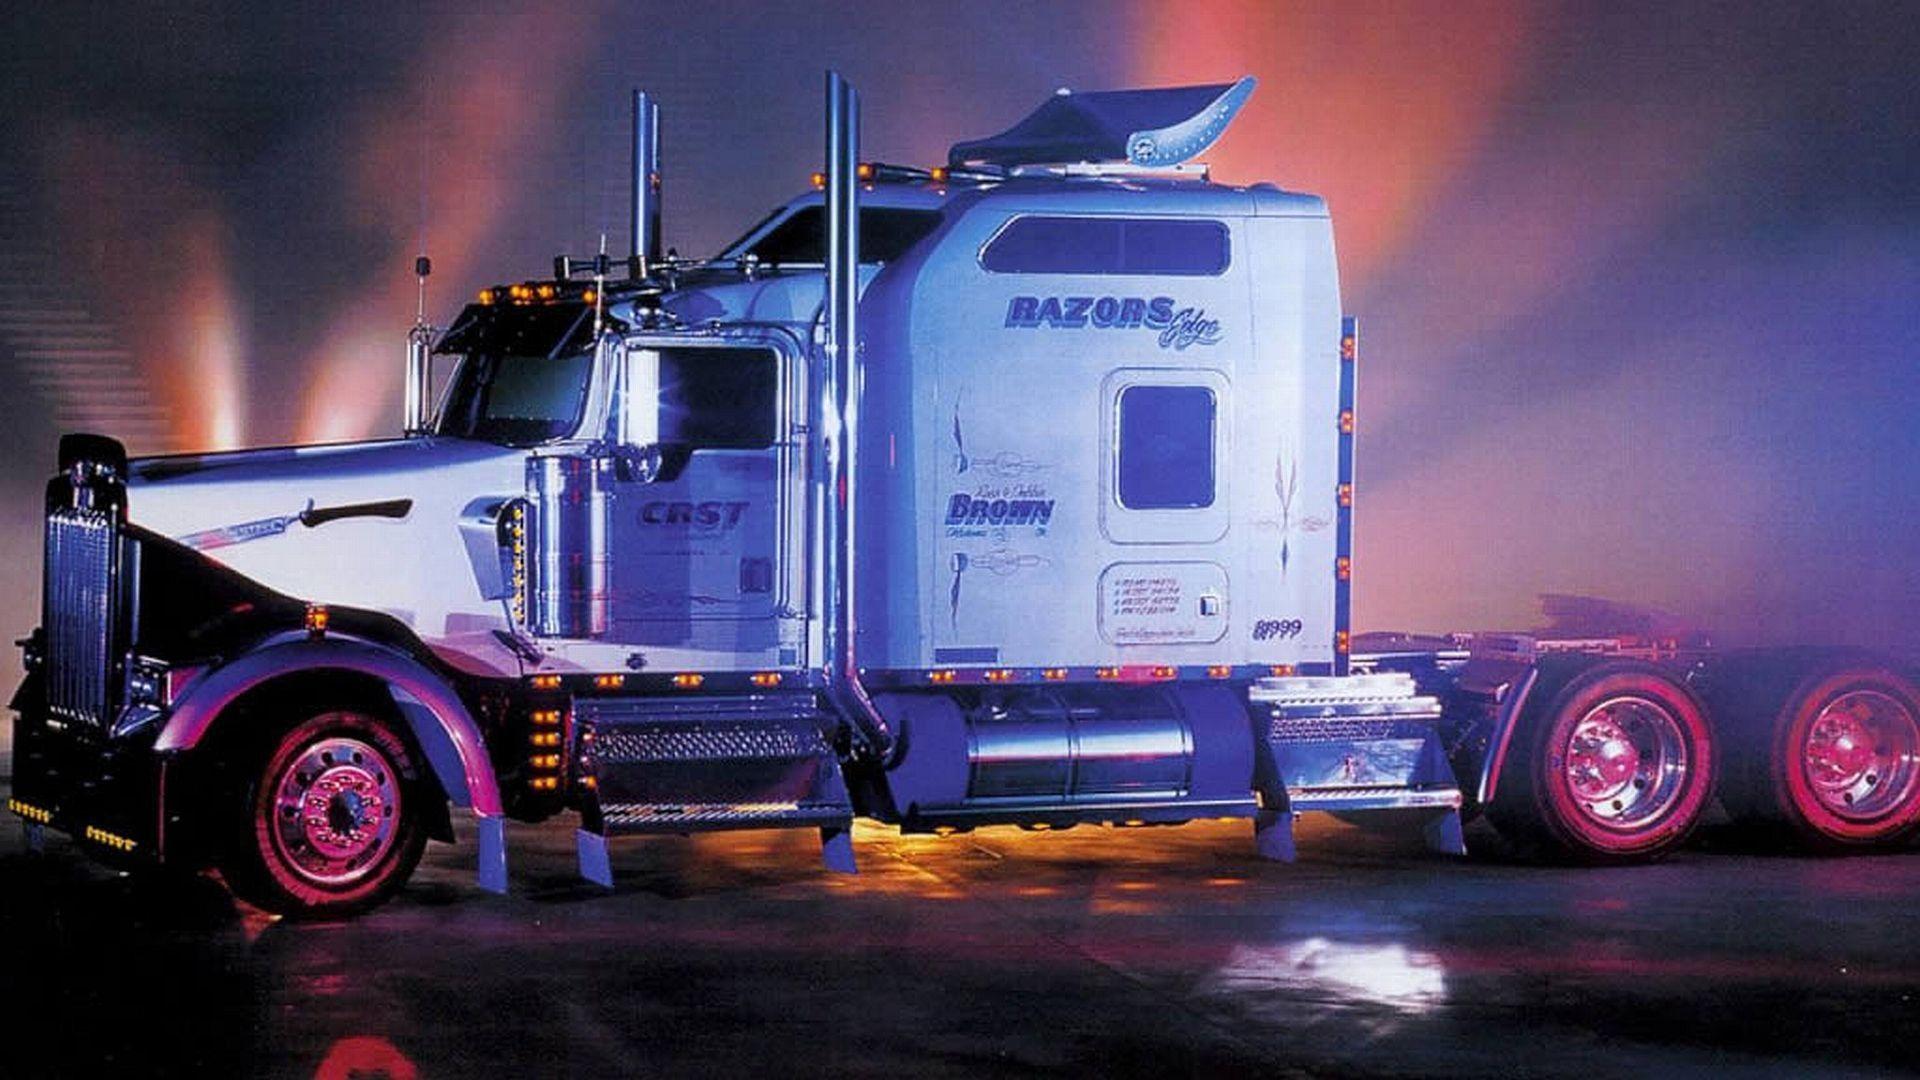 Inspirational Truck Background Truck Wallpaper Trucks Truck Pictures